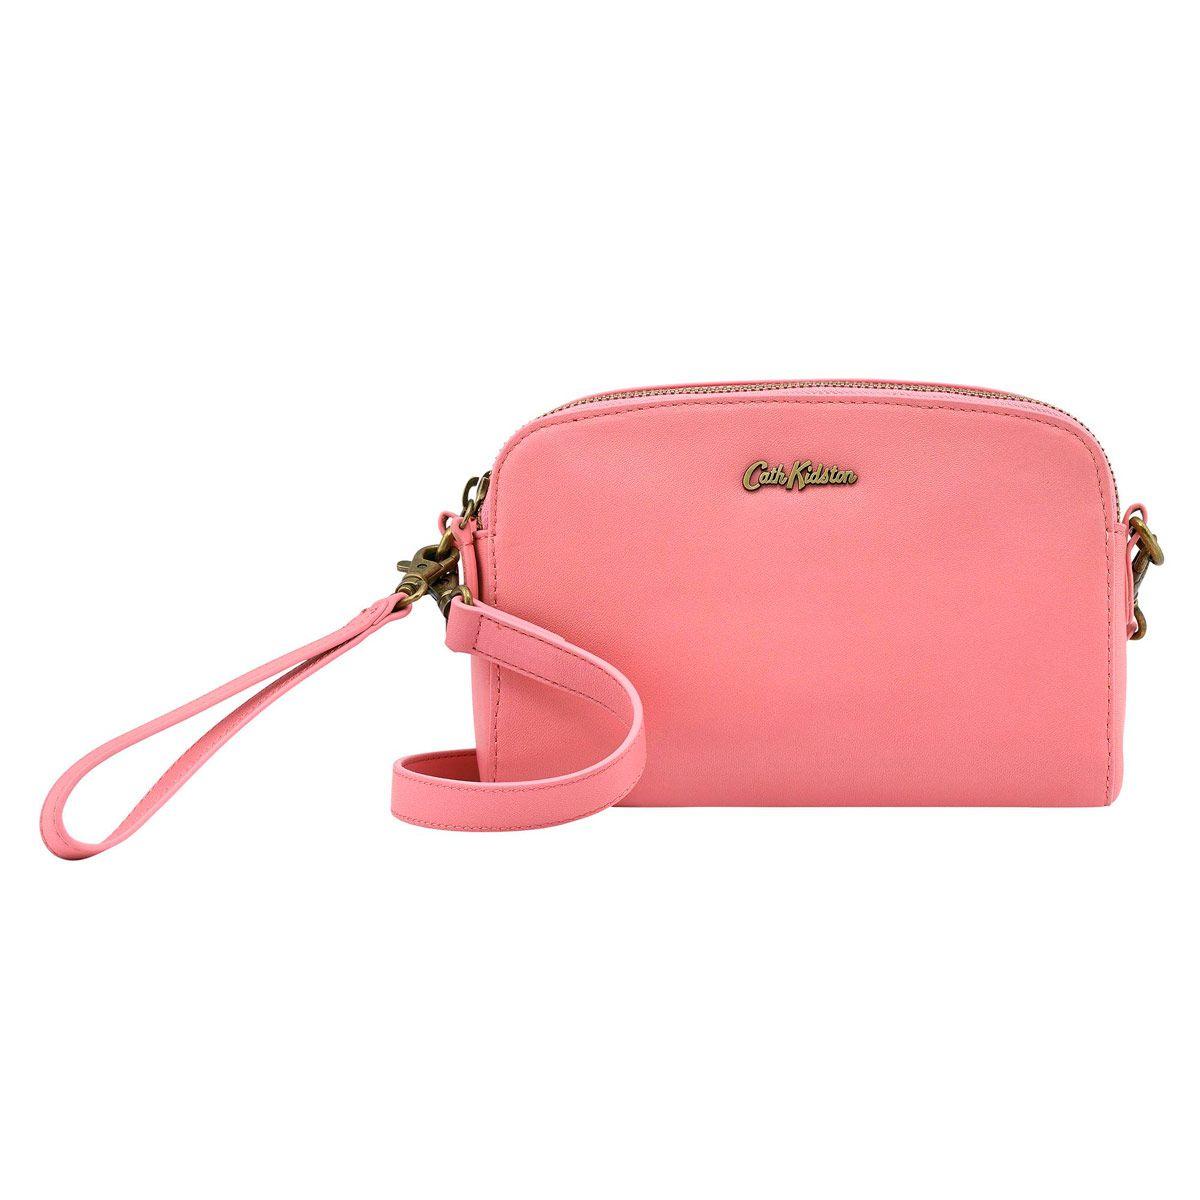 Mini Leather Double Zip Bag Bags Cathkidston